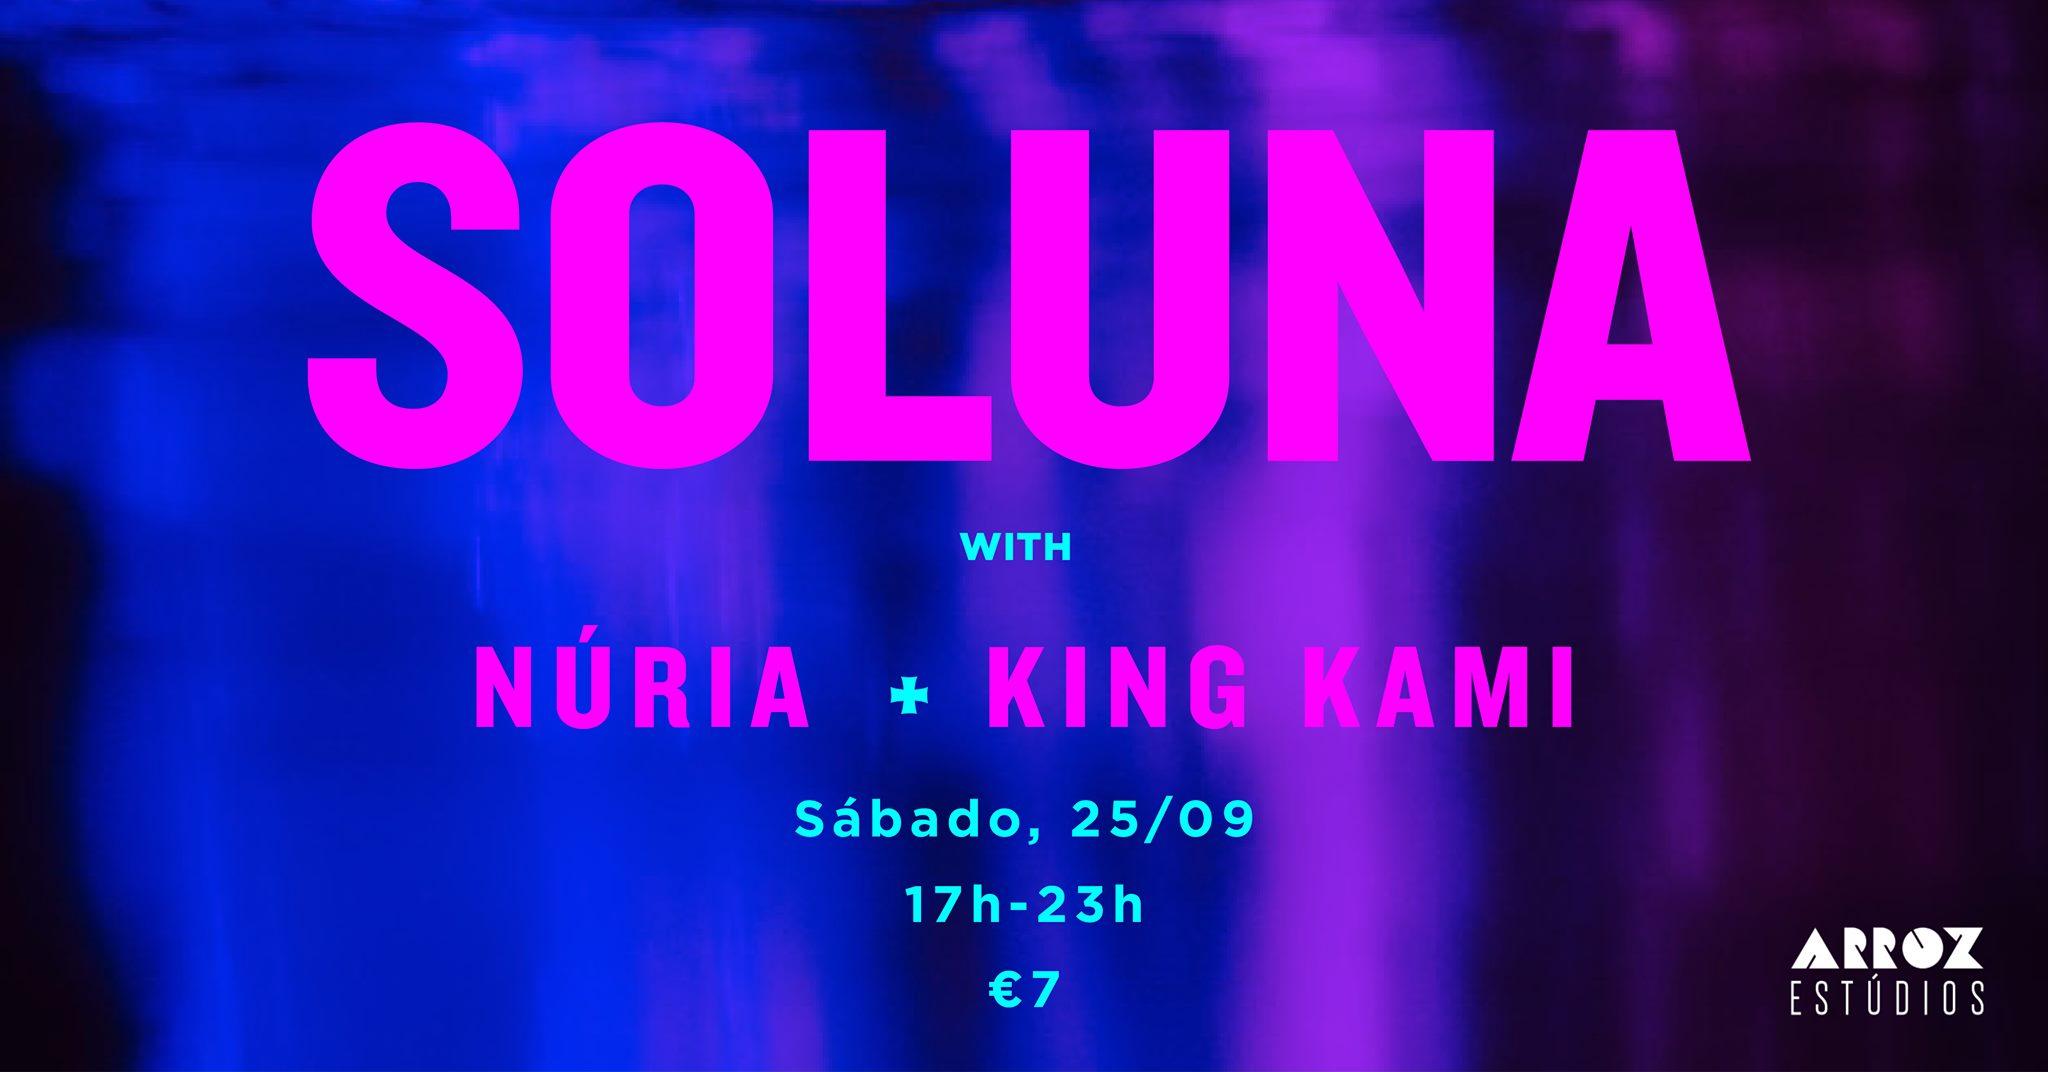 Soluna & Friends @ Arroz Estudios